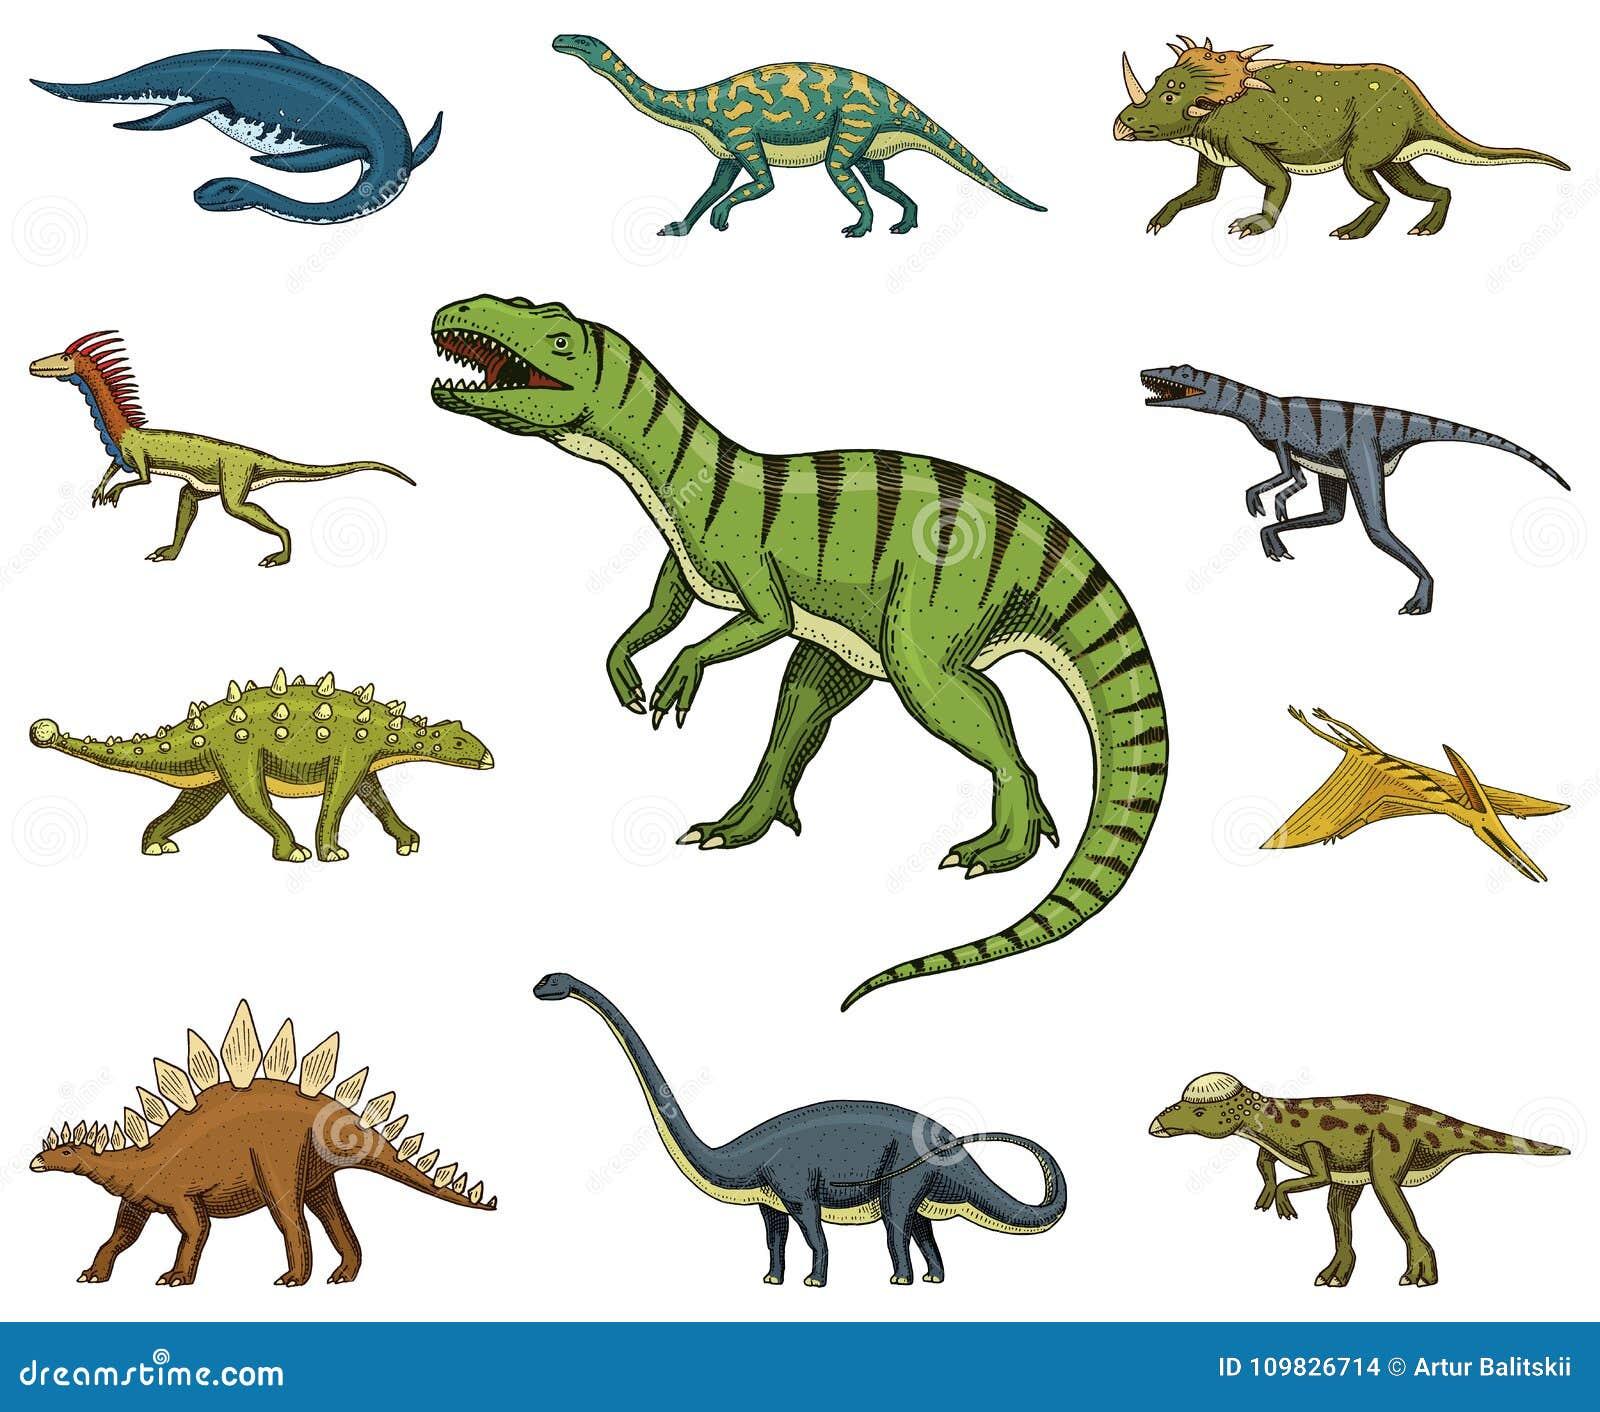 Los dinosaurios fijaron, rex del tiranosaurio, Triceratops, Barosaurus, Diplodocus, Velociraptor, Triceratops, Stegosaurus, esque